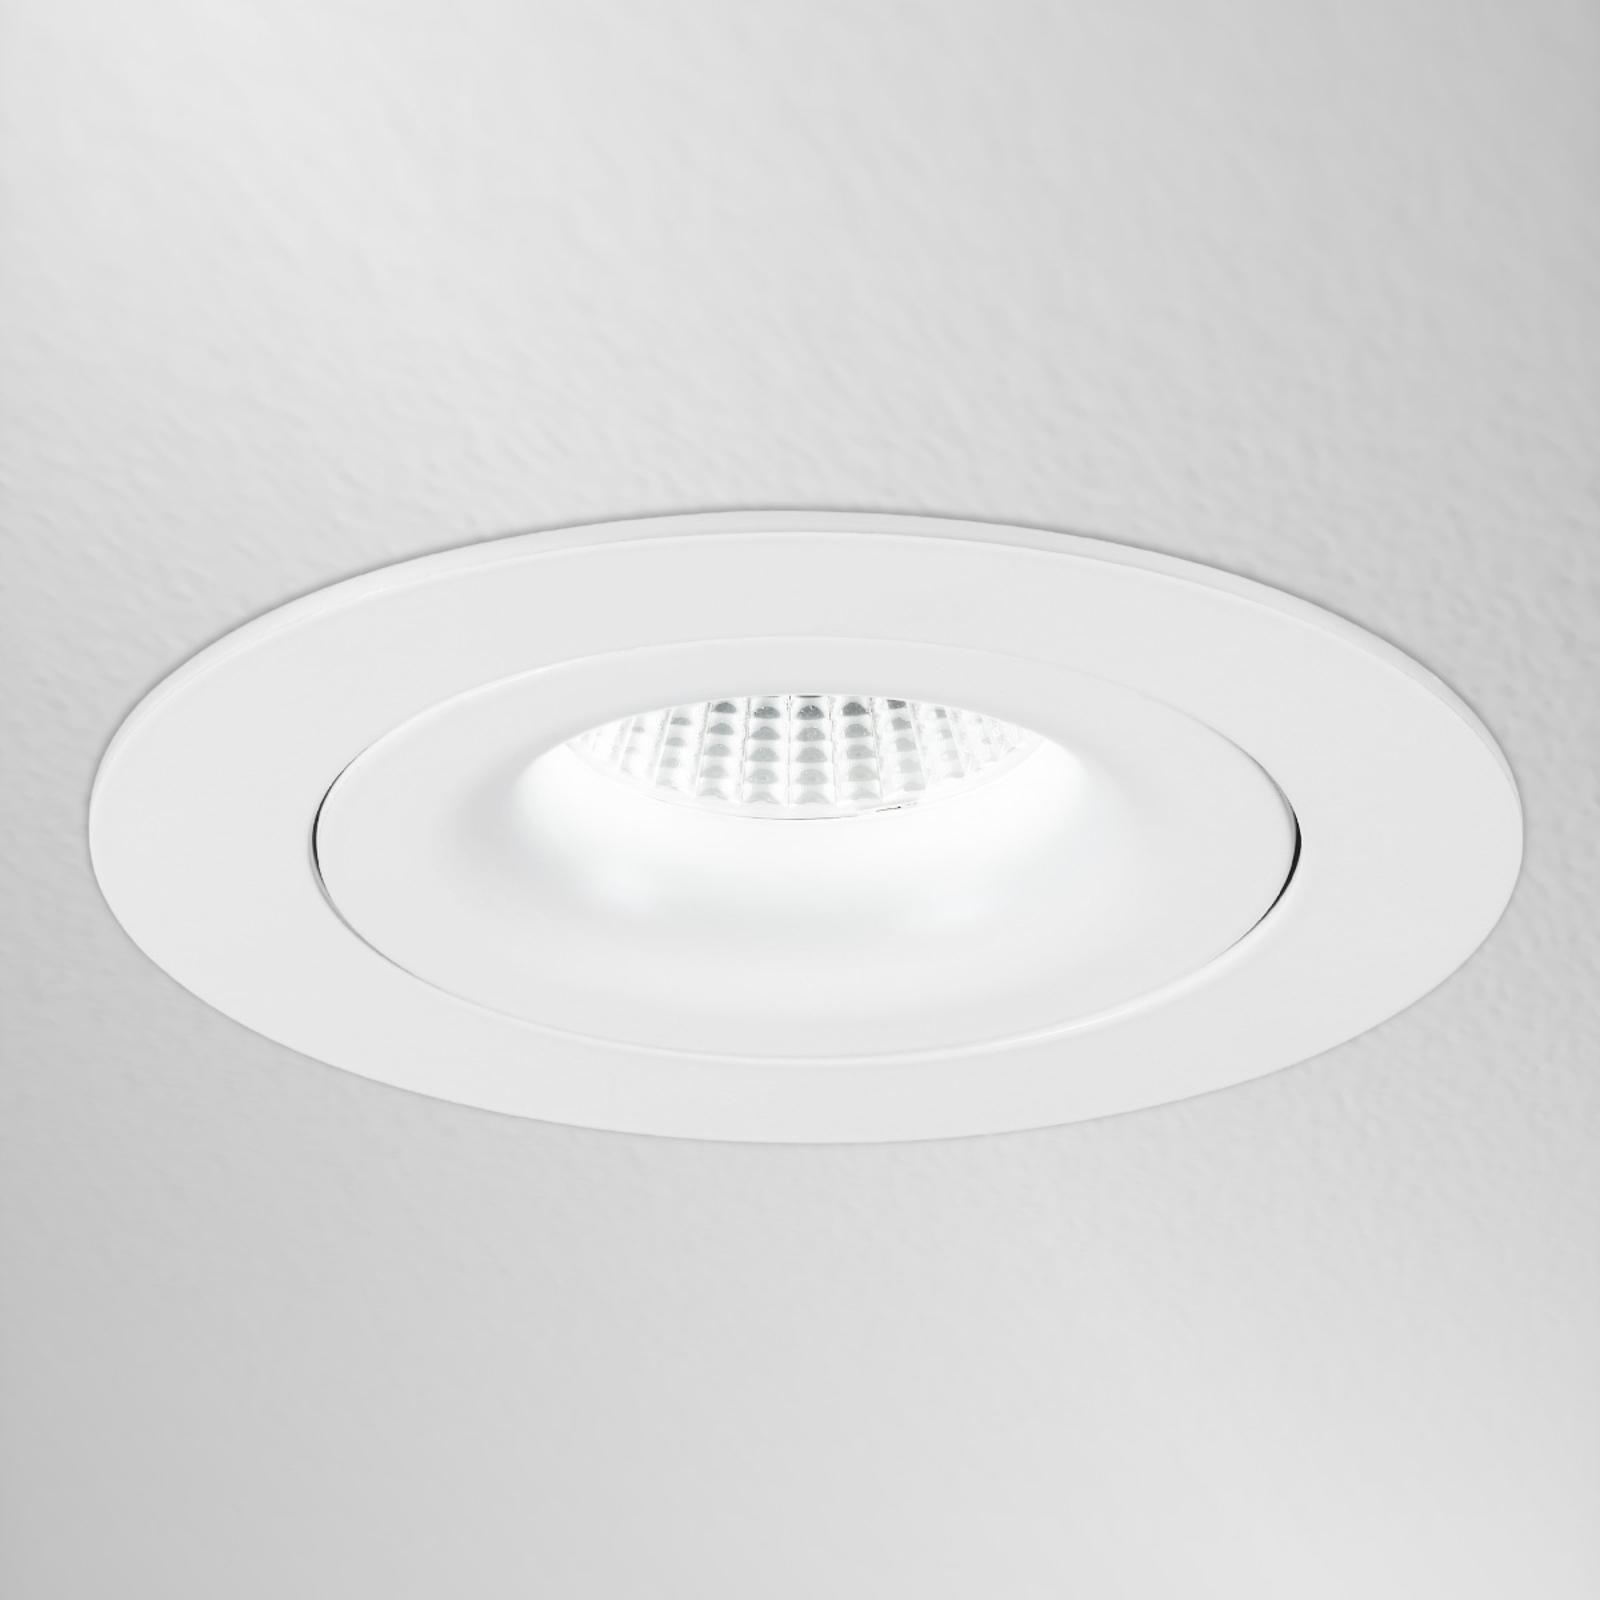 Rund LED-downlight MK 110